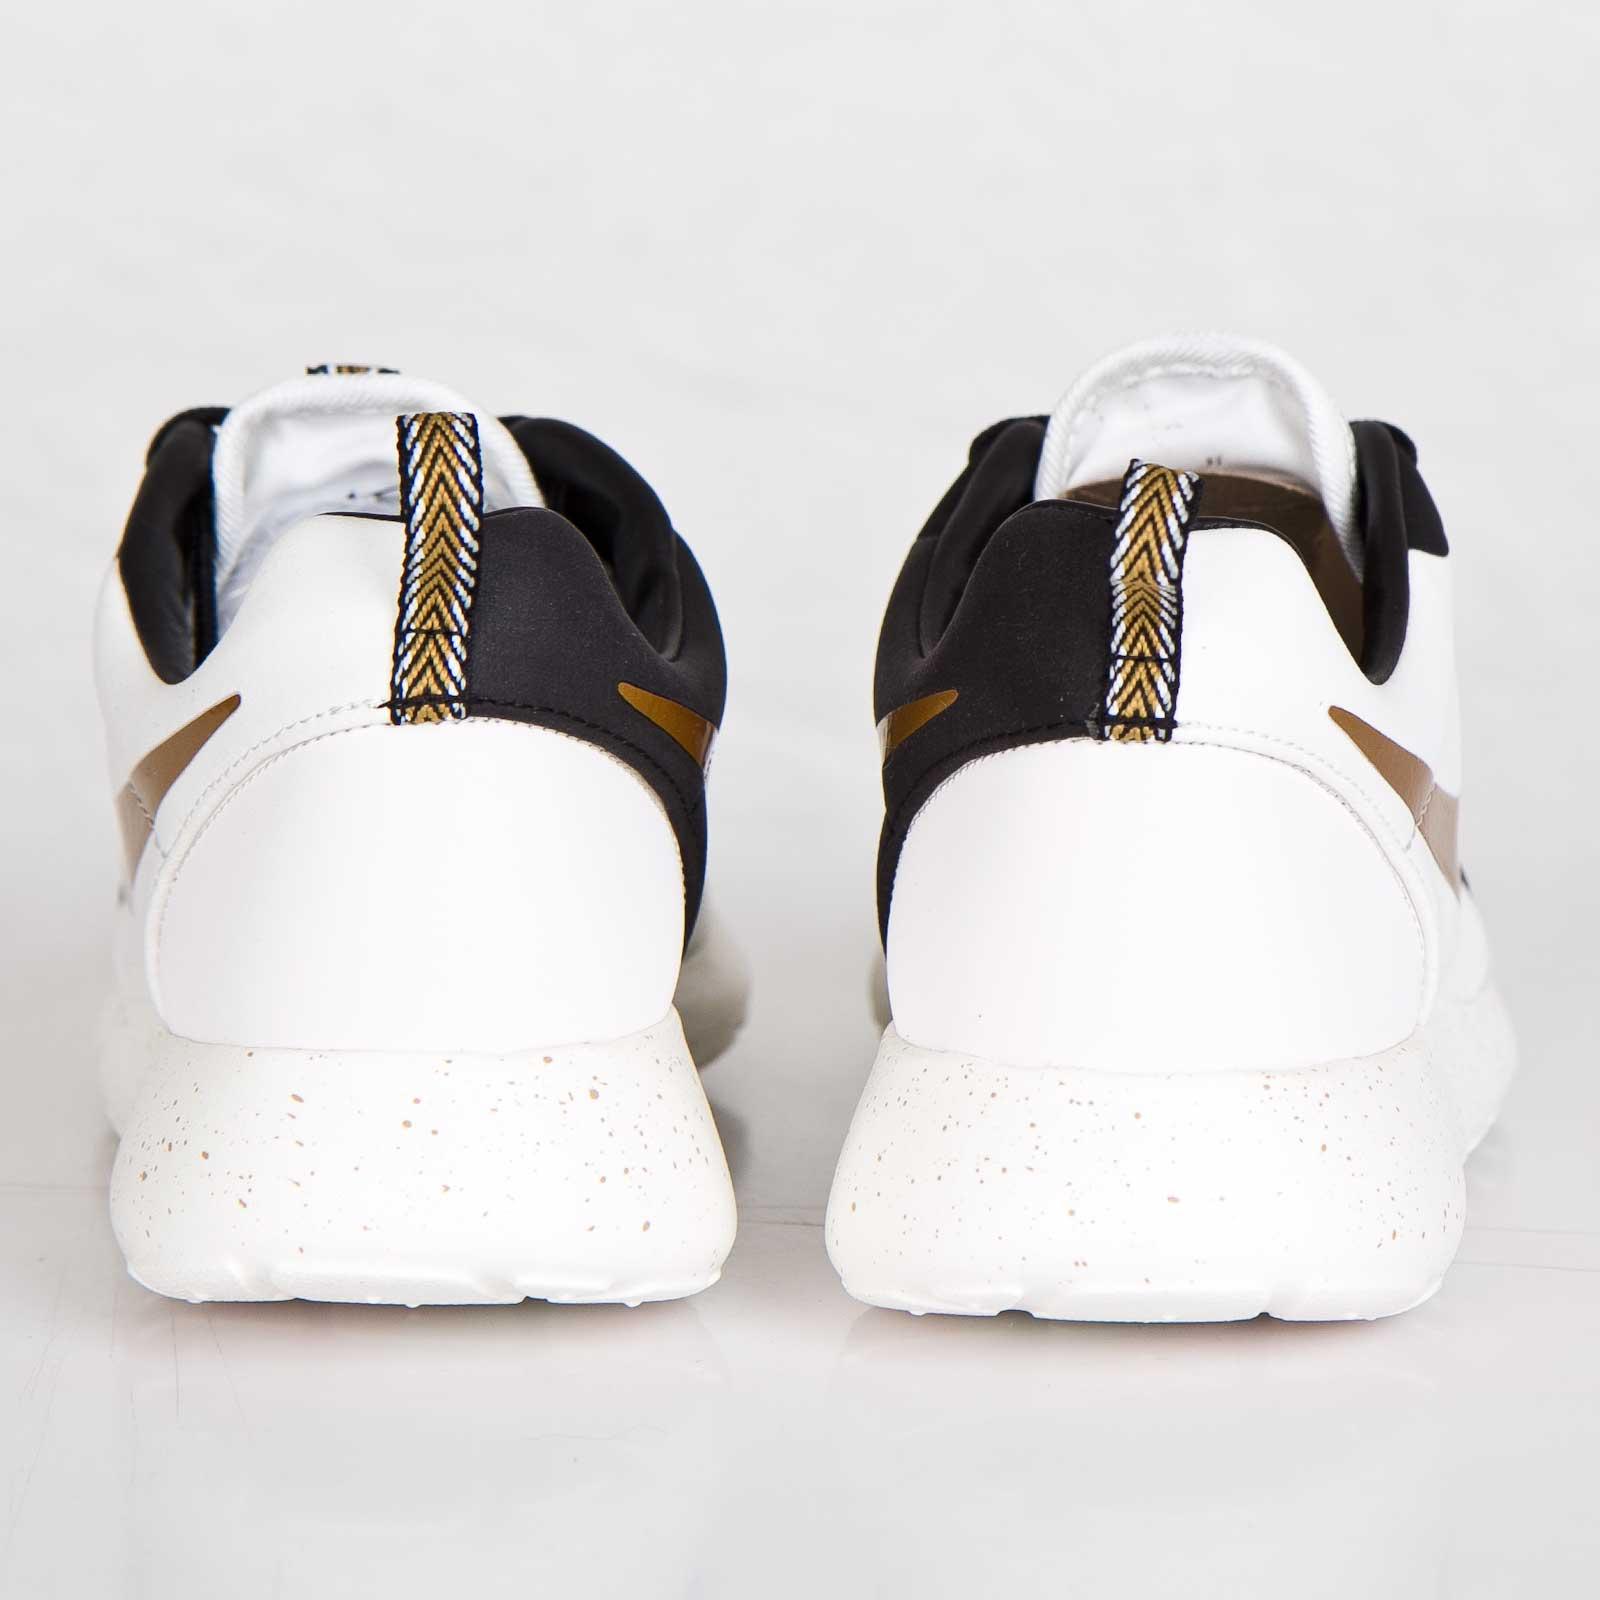 outlet store 2034d 30b00 Nike Roshe Run Hyperfuse Premium QS - 669689-100 - Sneakersnstuff    sneakers   streetwear online since 1999